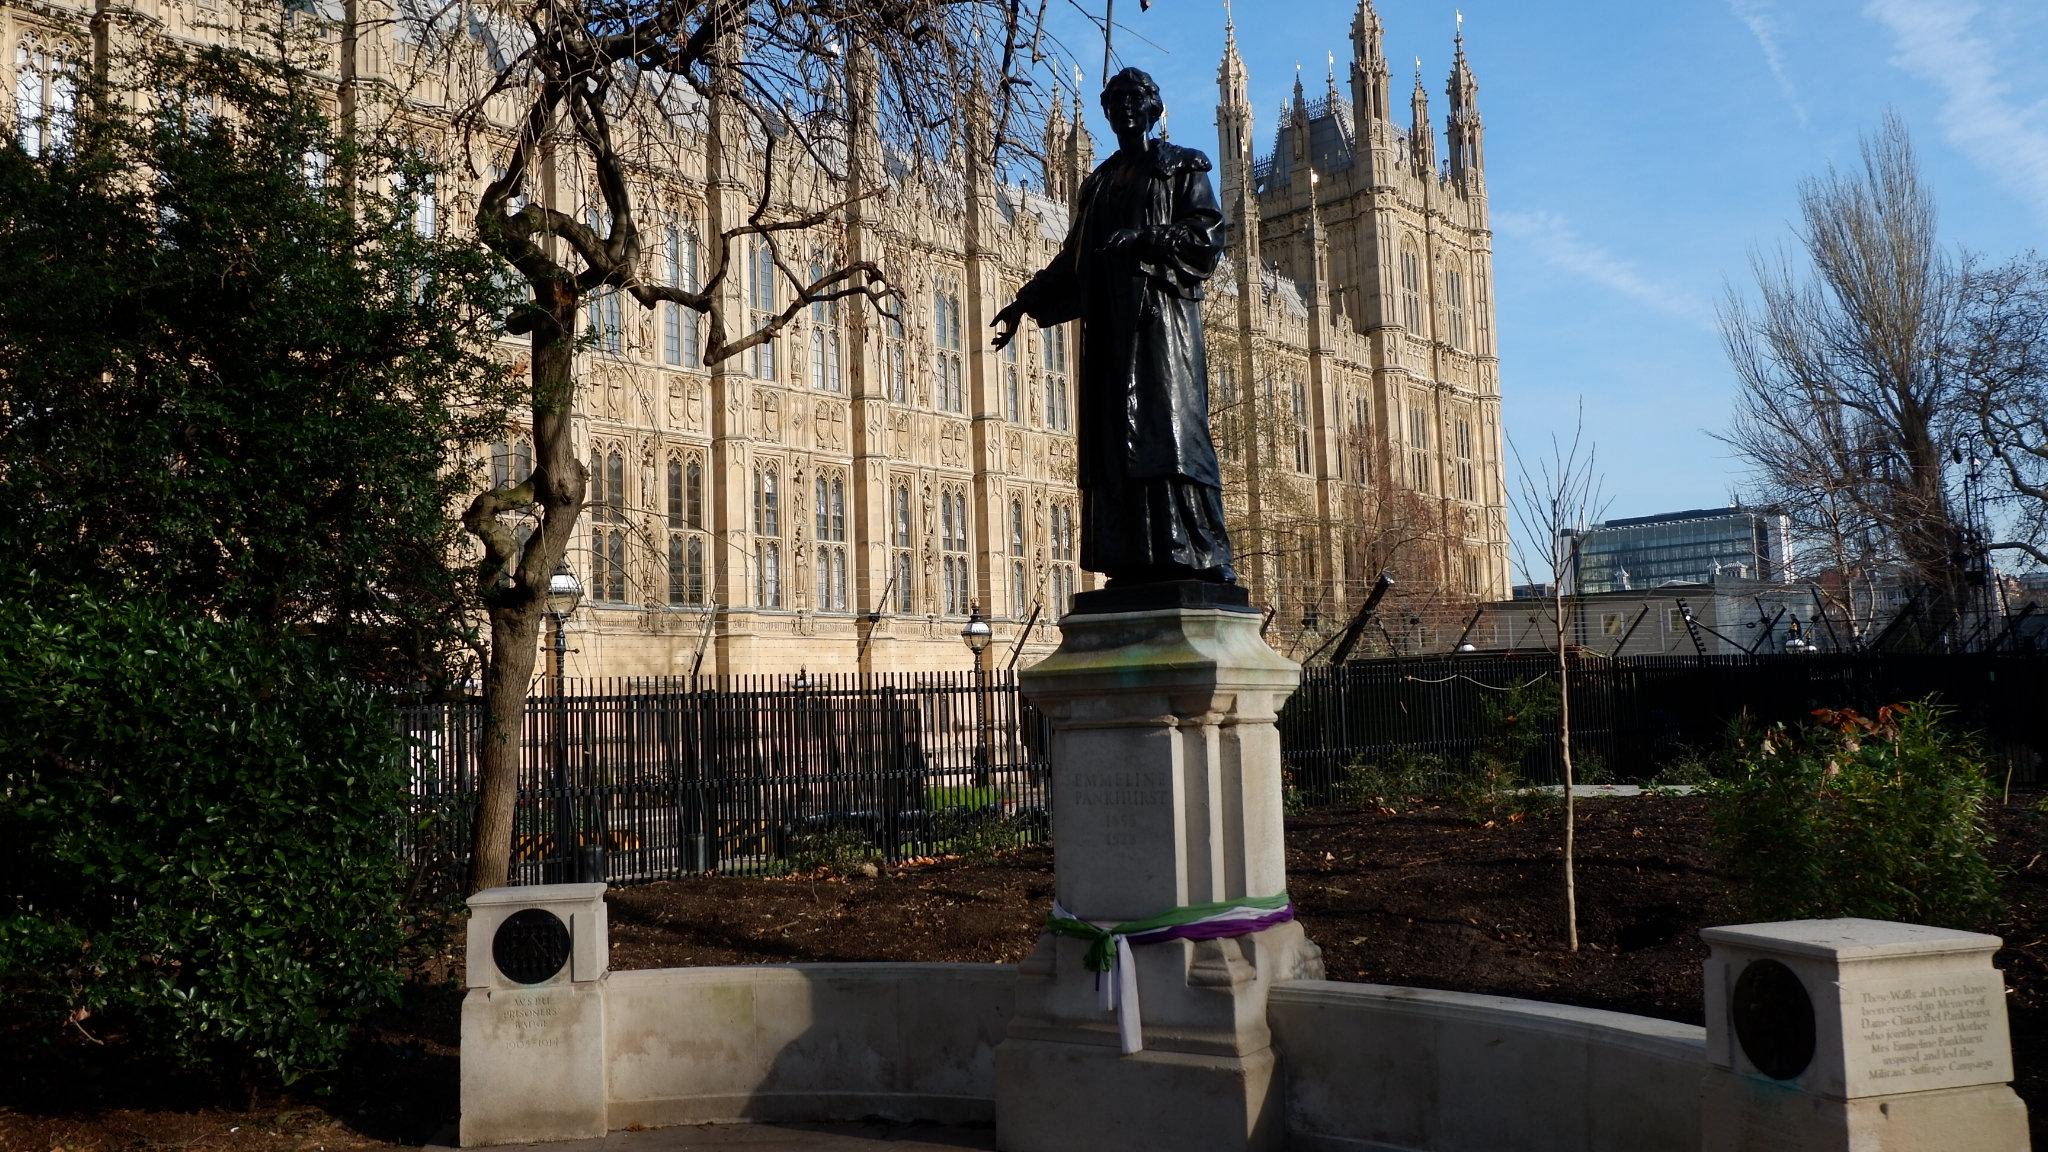 walking tours of london womens history walking tours of london womens history herstory tour guide emmeline pankhurst suffragette house of parliament westminster